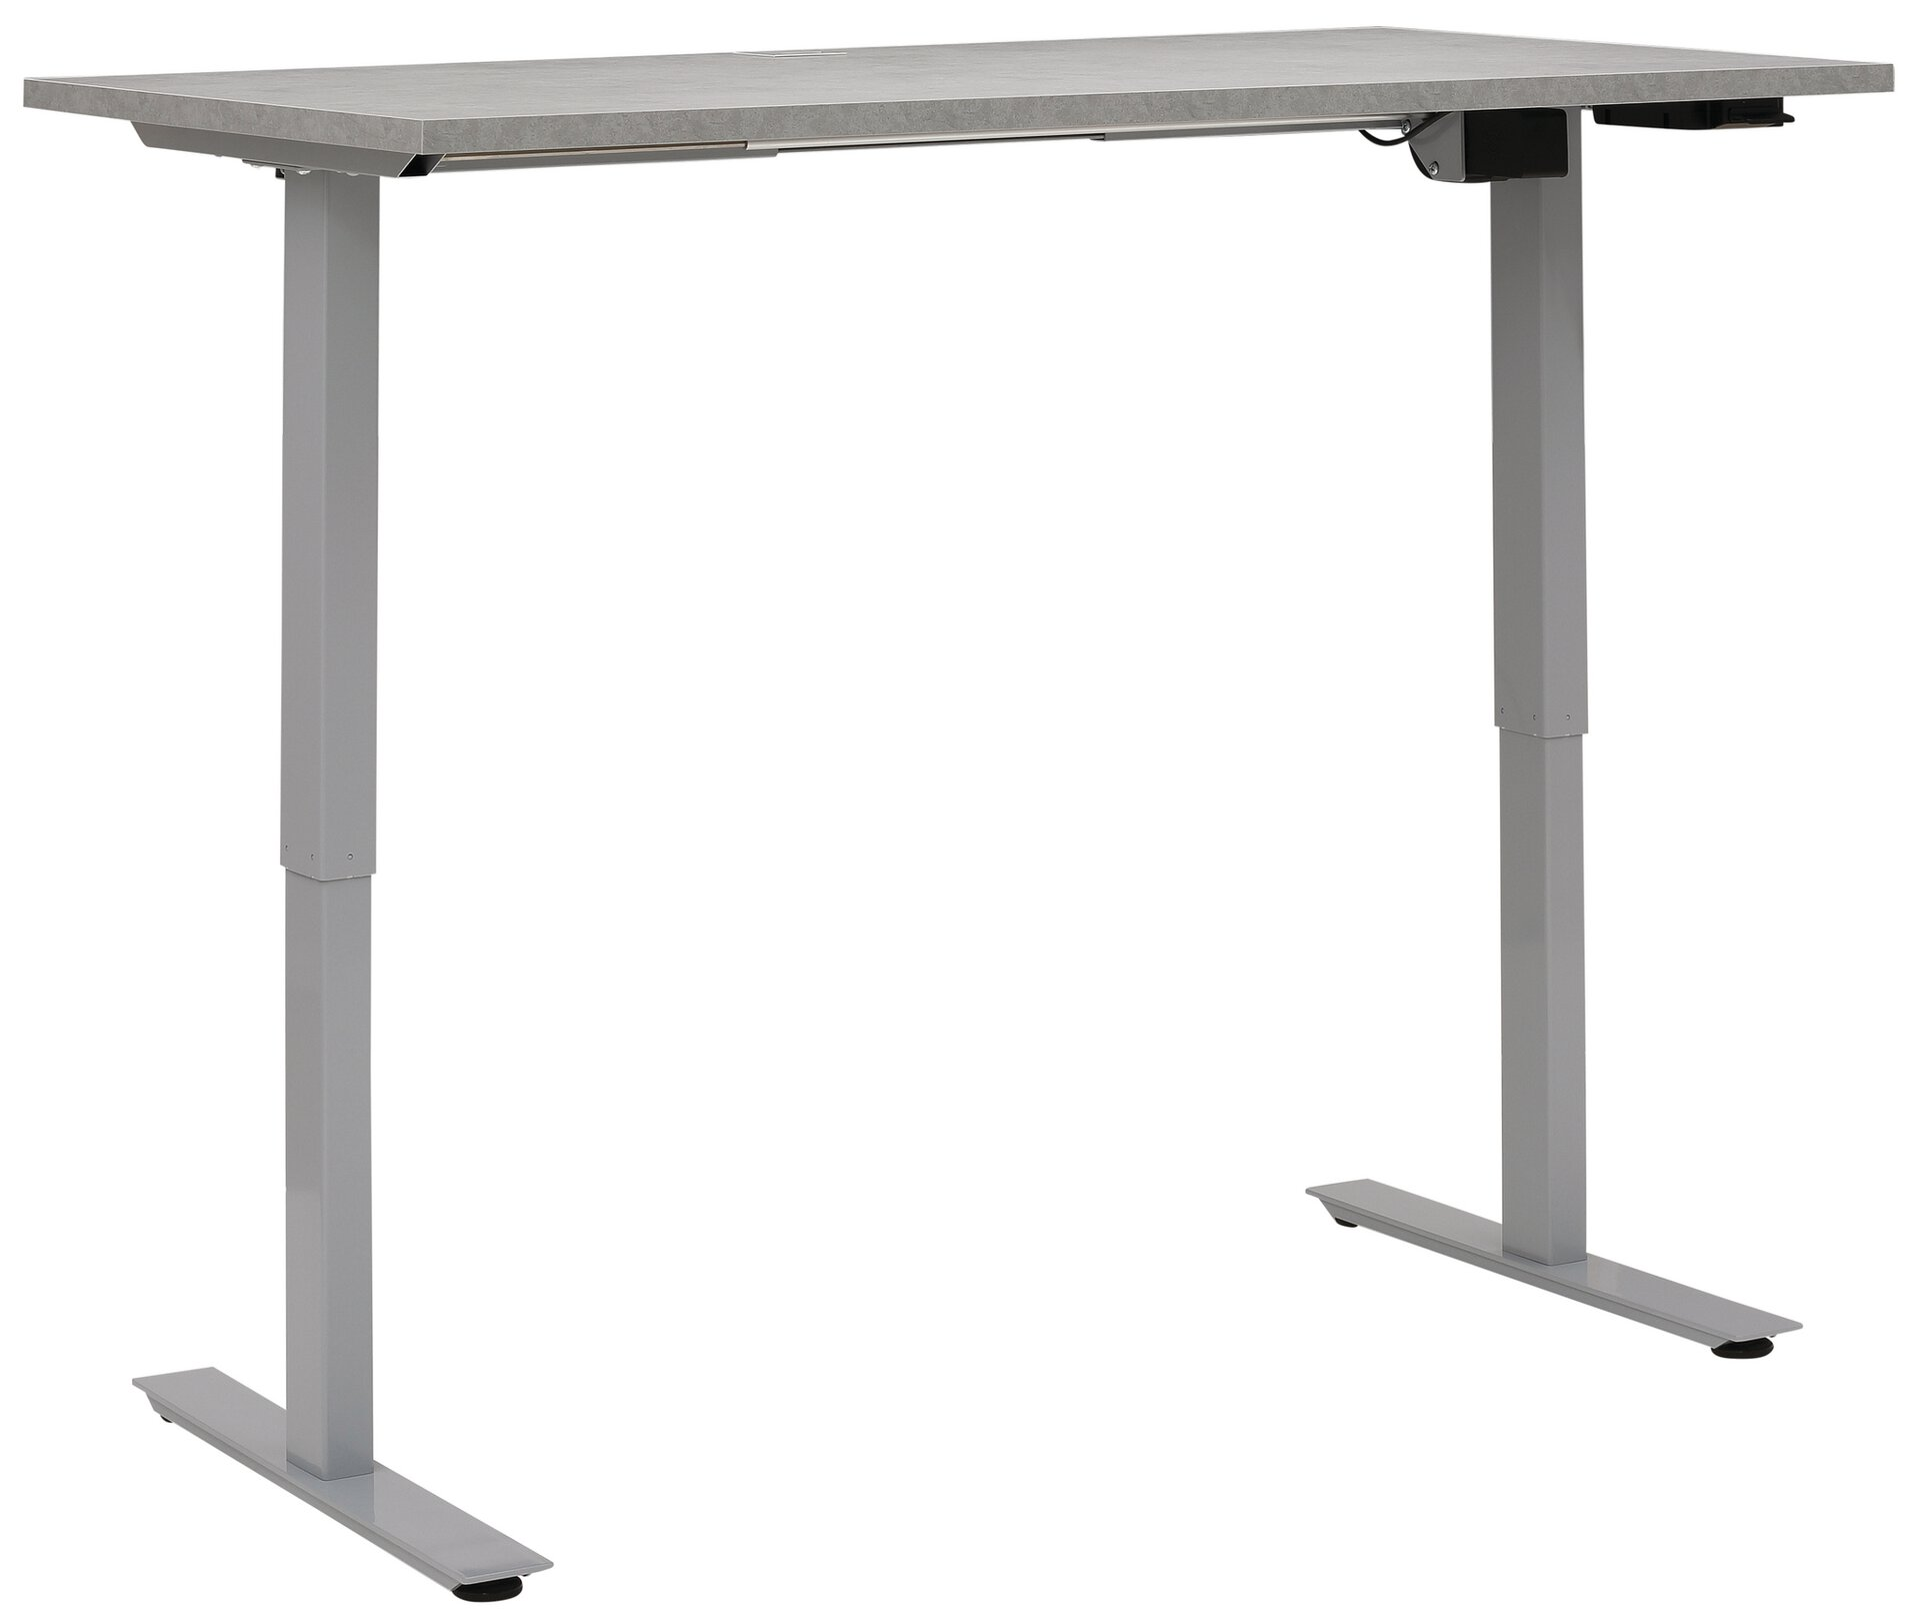 Schreibtisch Maja Möbel Metall grau 1 x 1 x 2 cm